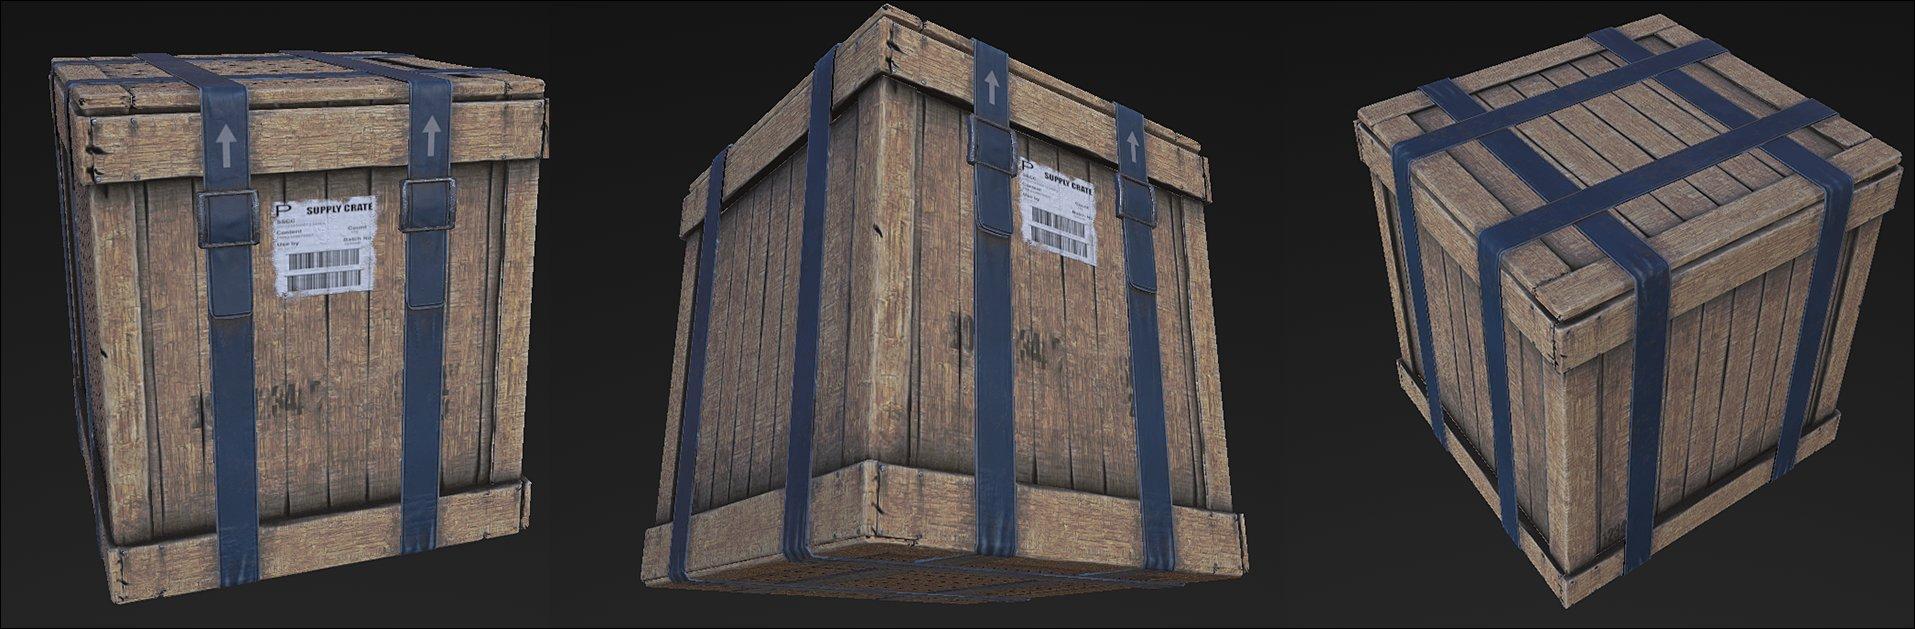 Daniel conroy crate 1 texture wip